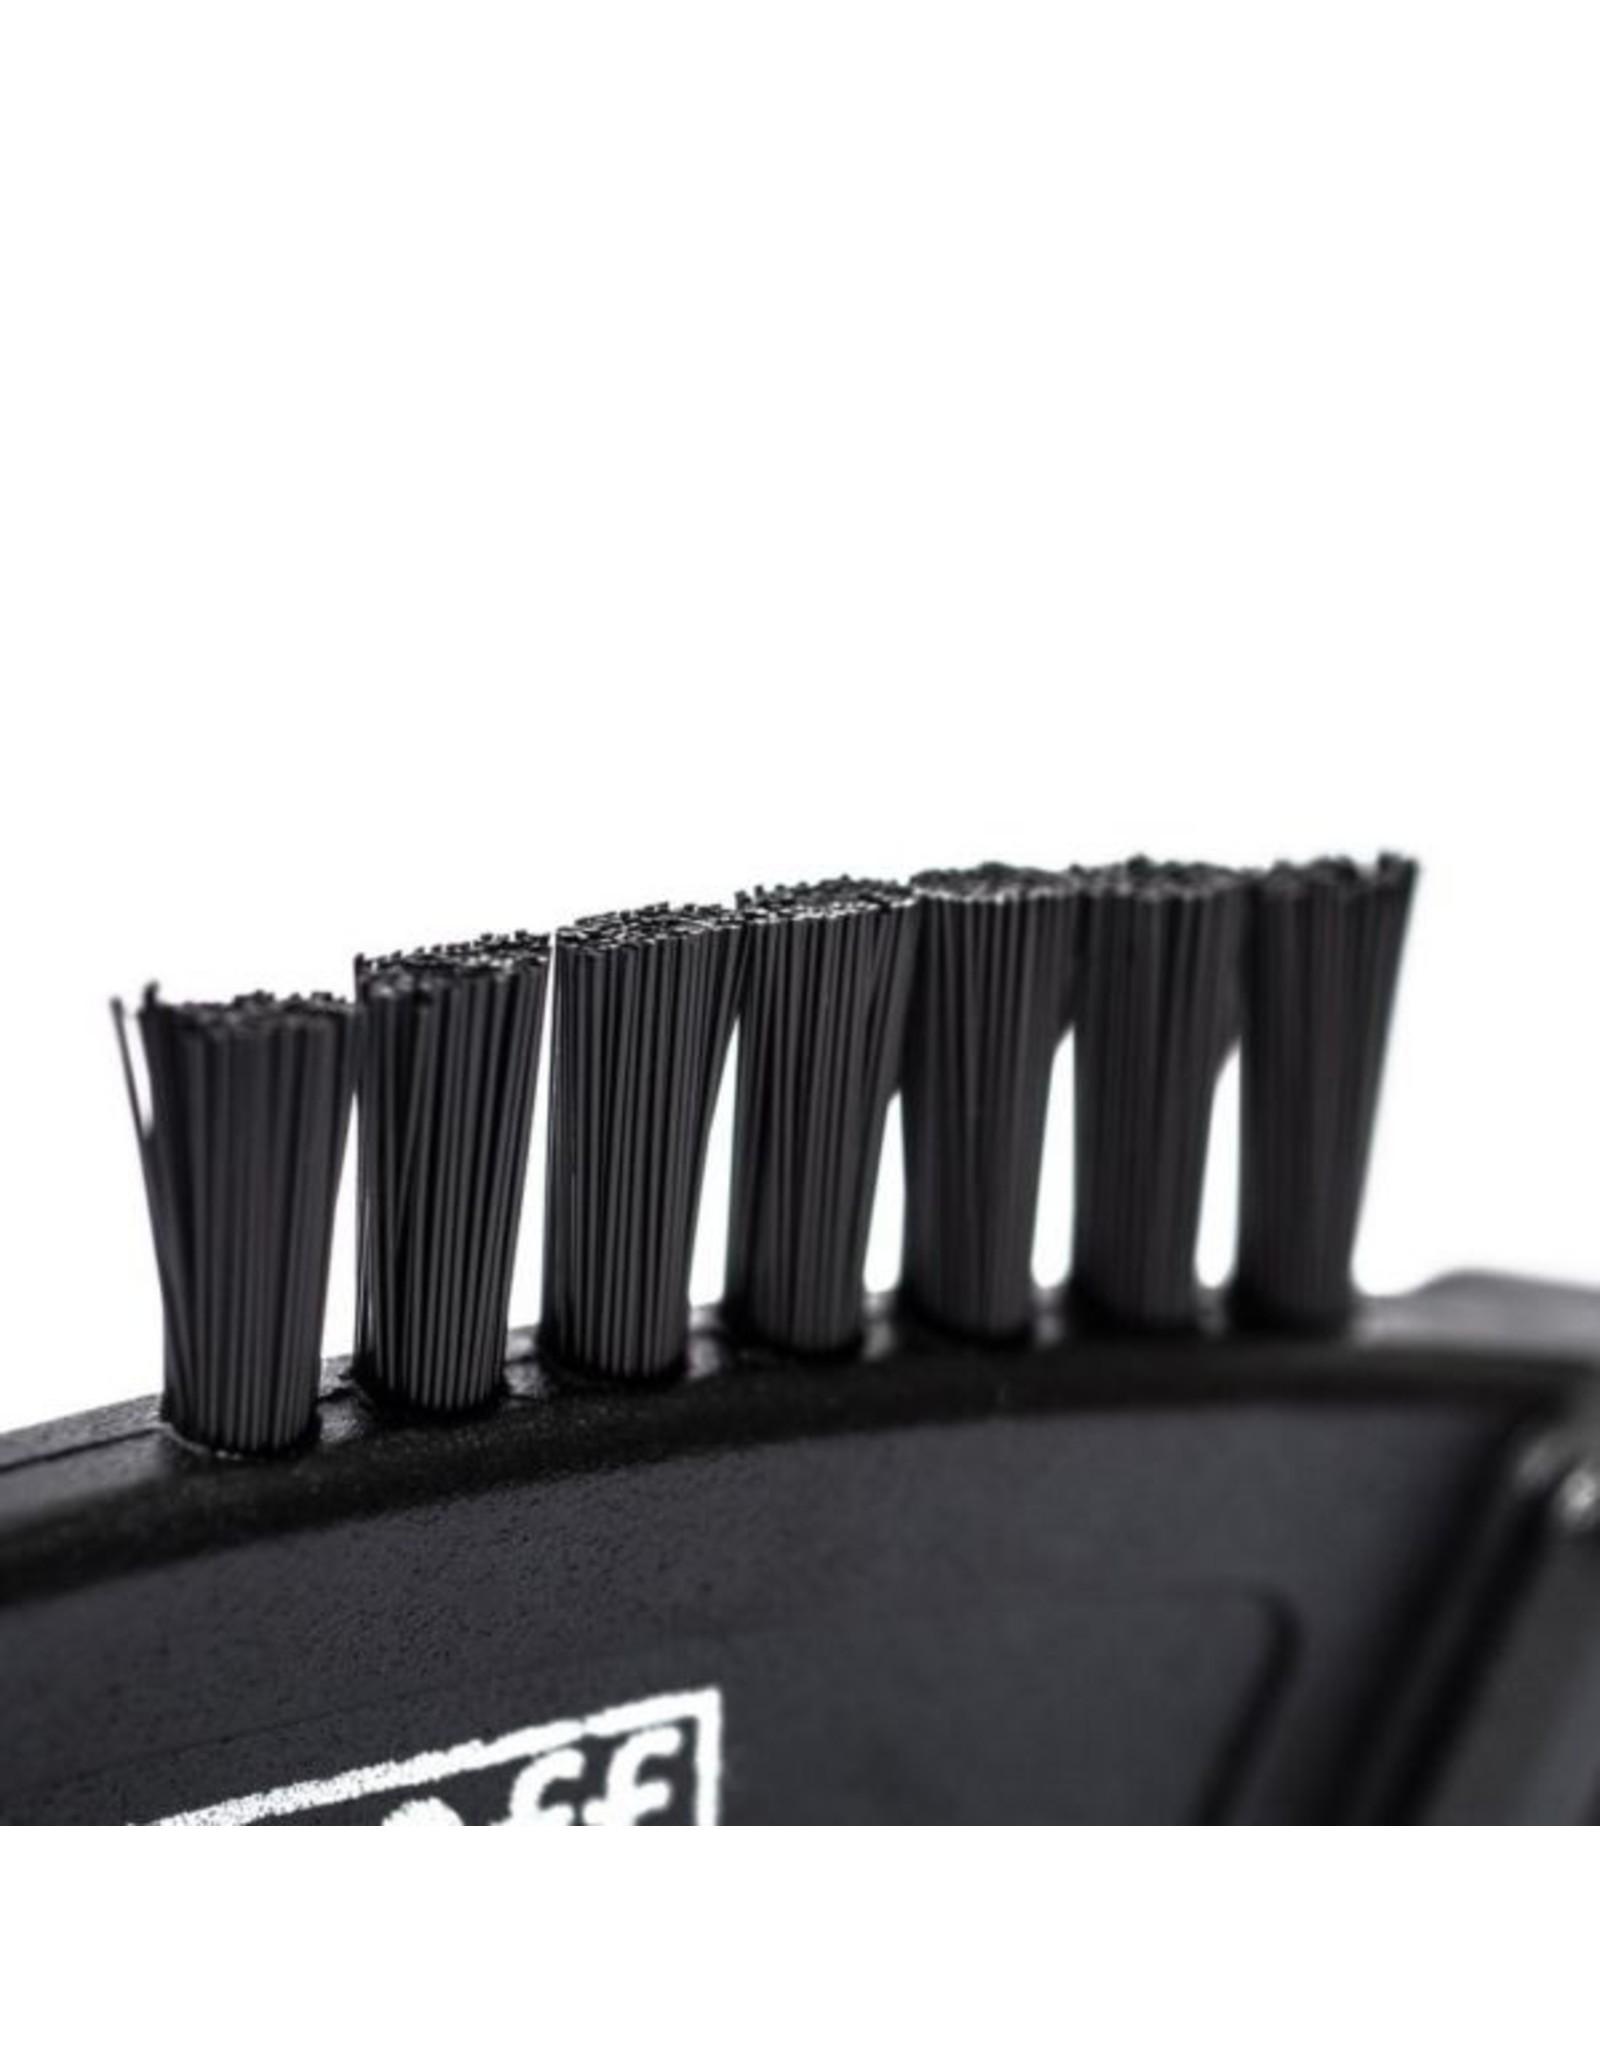 Muc-Off Muc-Off Drivetrain Claw Brush